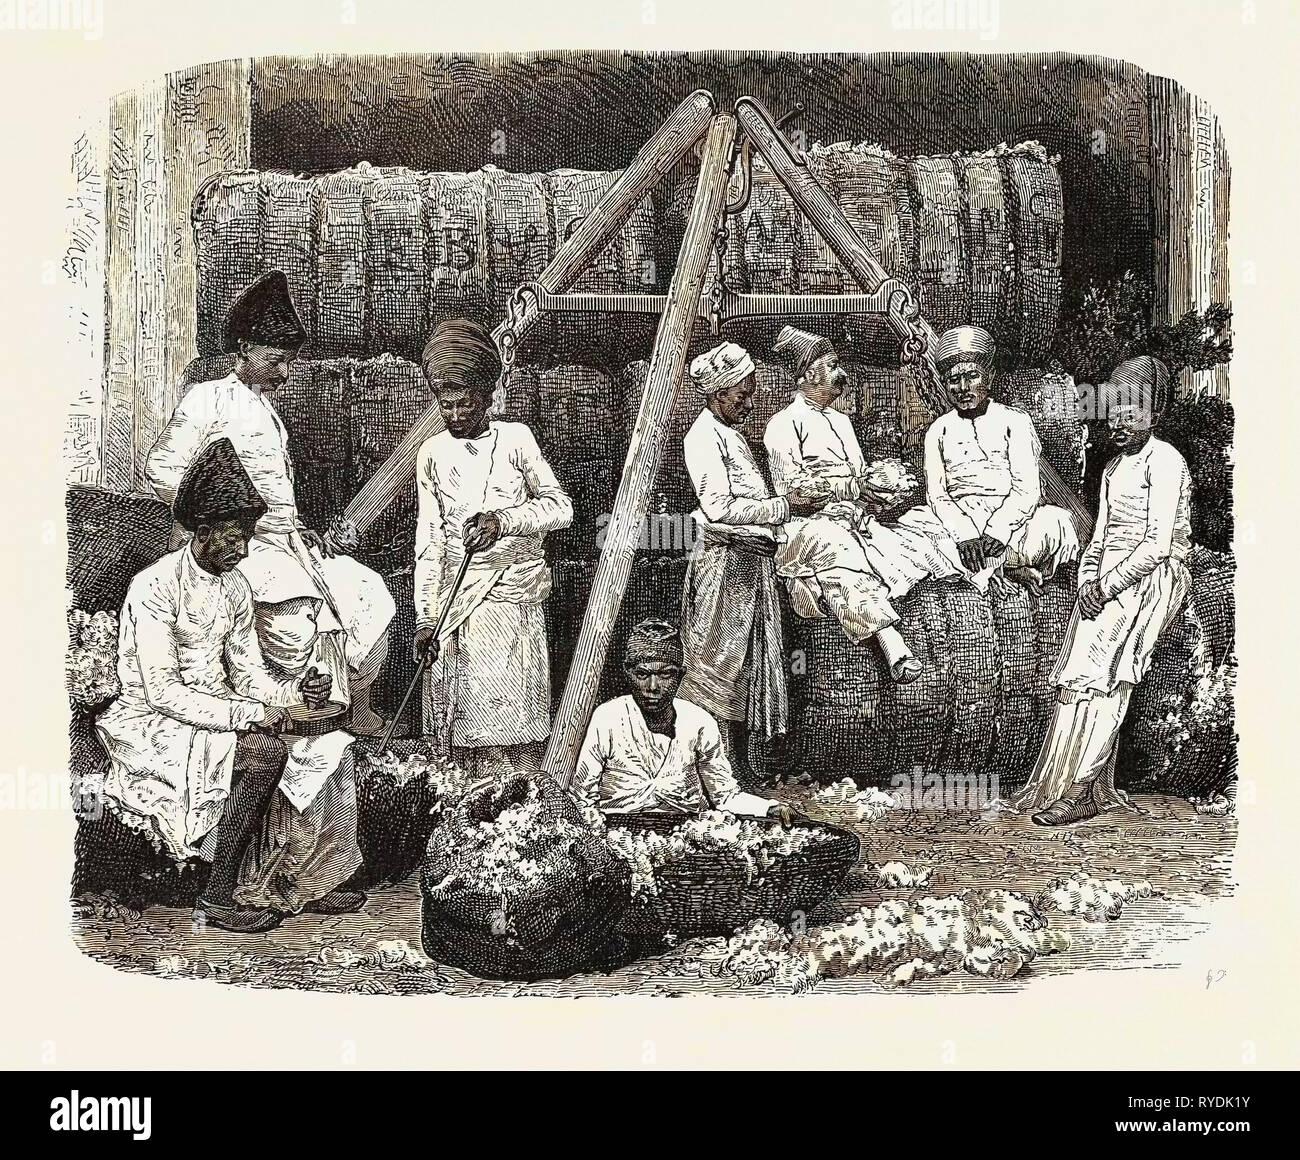 Parsee Cotton Merchants of Bombay, India - Stock Image